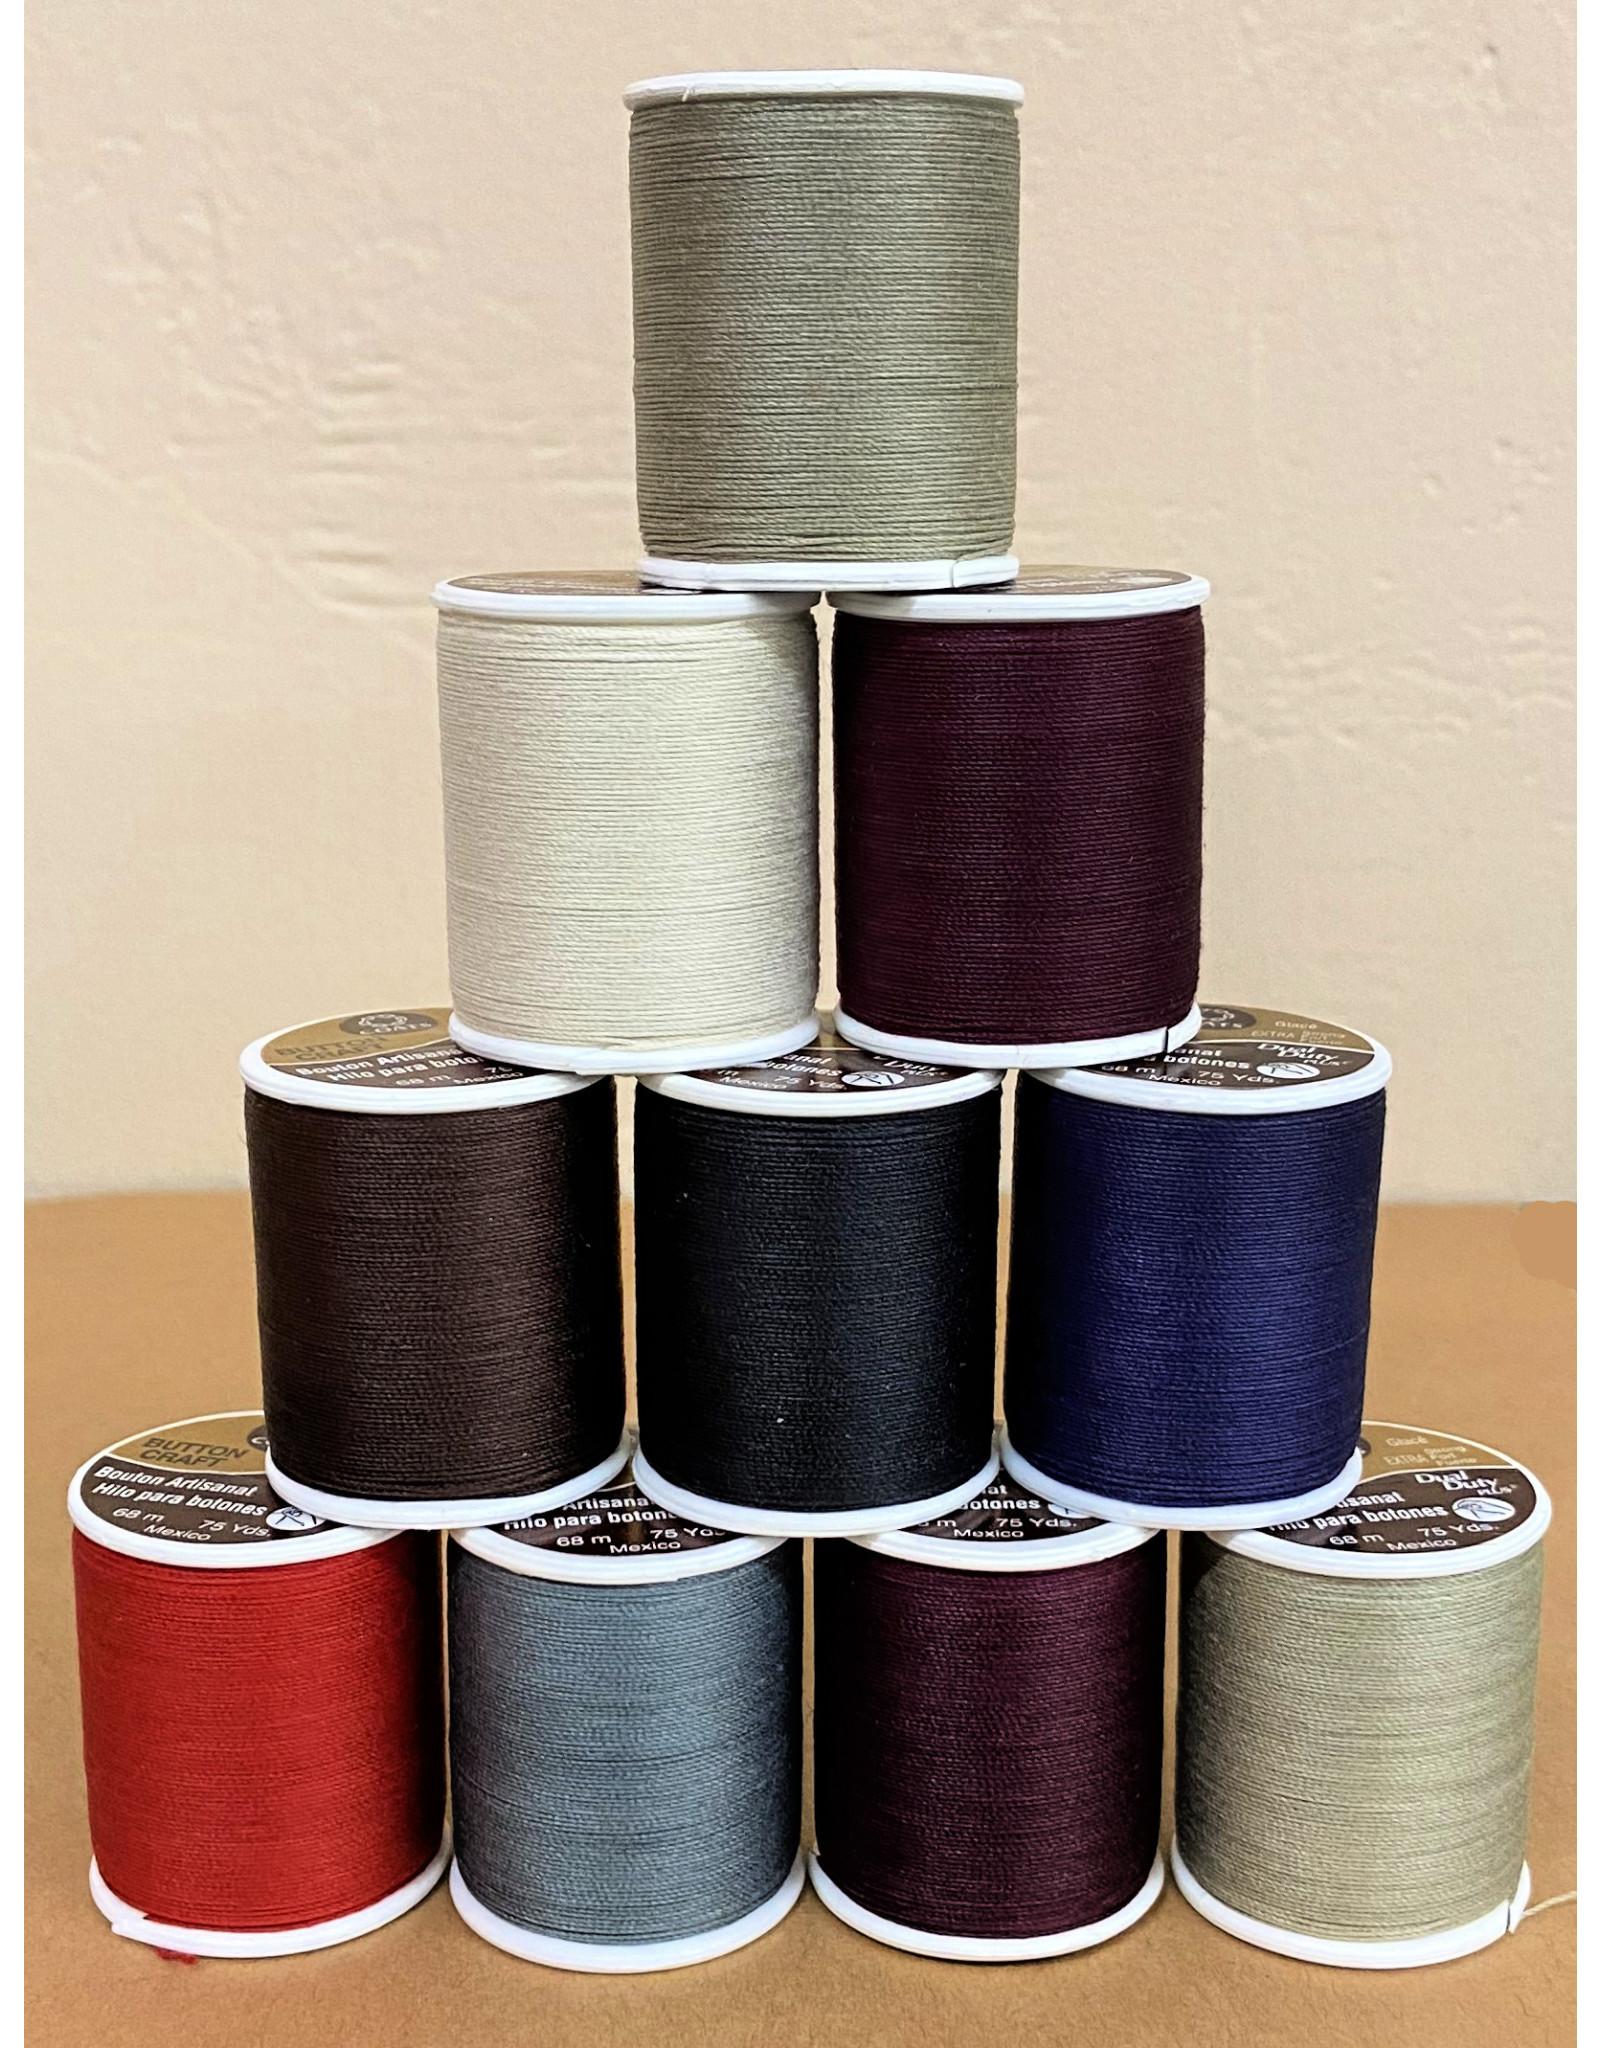 Coats & Clark Button Craft Thread, Dual Duty Plus, Color: Brown